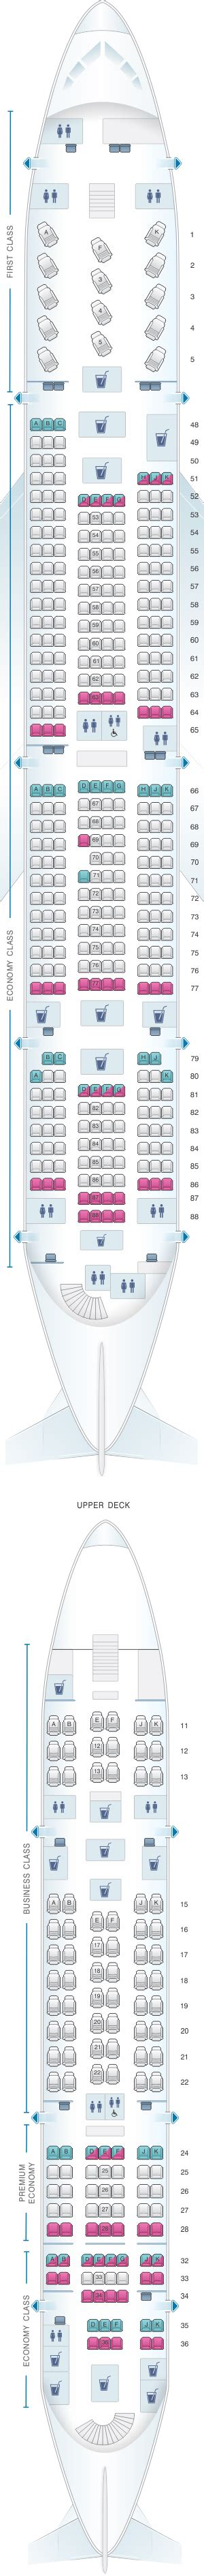 qantas a380 800 seating chart qantas a380 business class seating plan brokeasshome